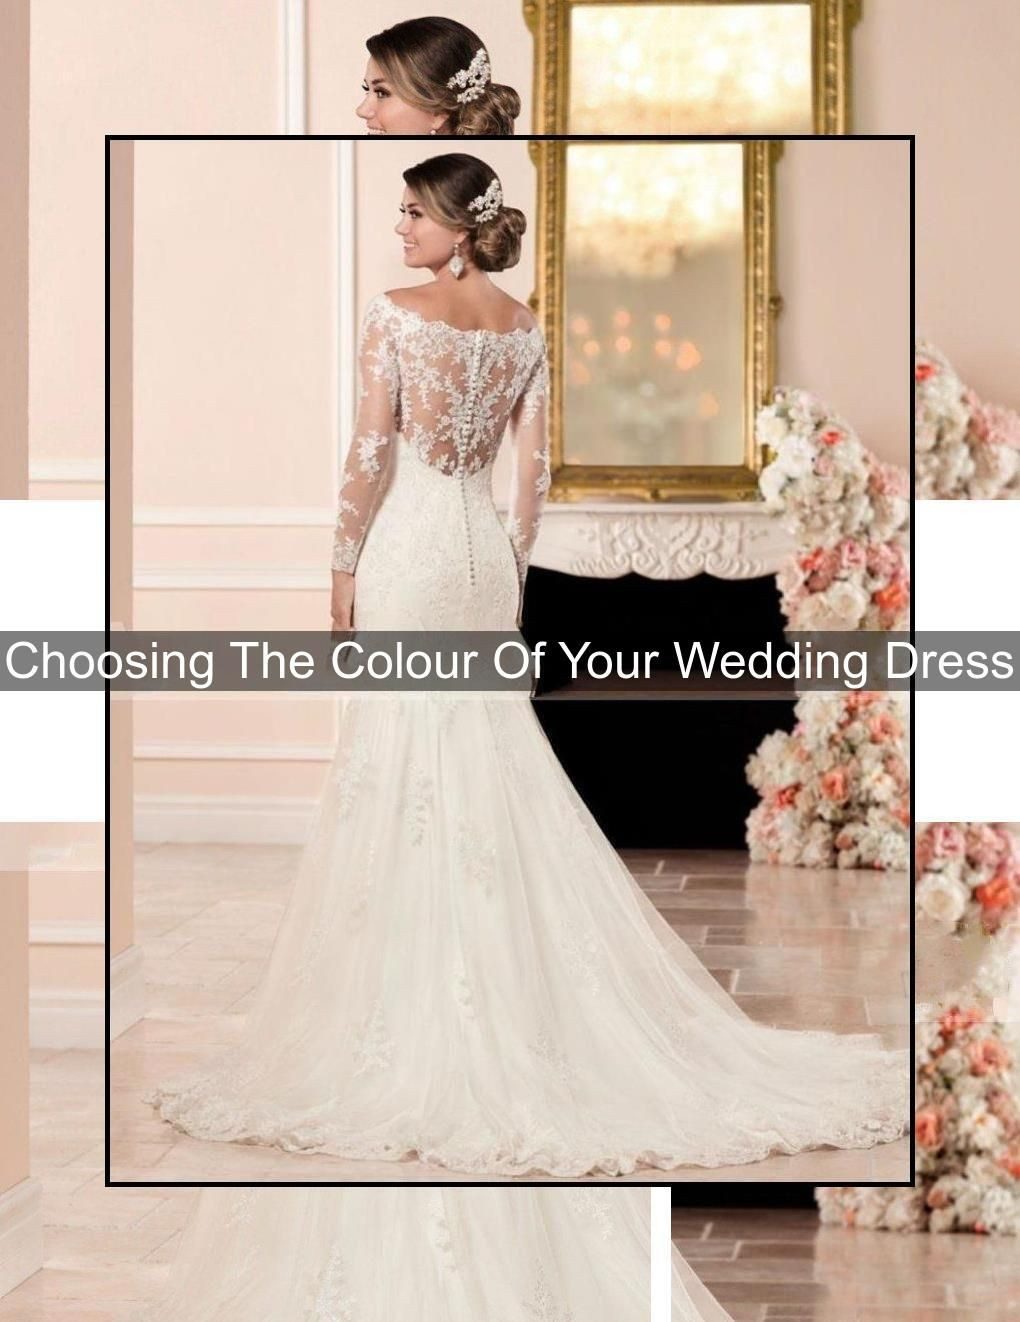 Wedding Dresses Near Me Wedding Dress Ideas Cheap Wedding Gowns Near Me In 2020 Wedding Dresses Dresses Wedding Dresses Near Me